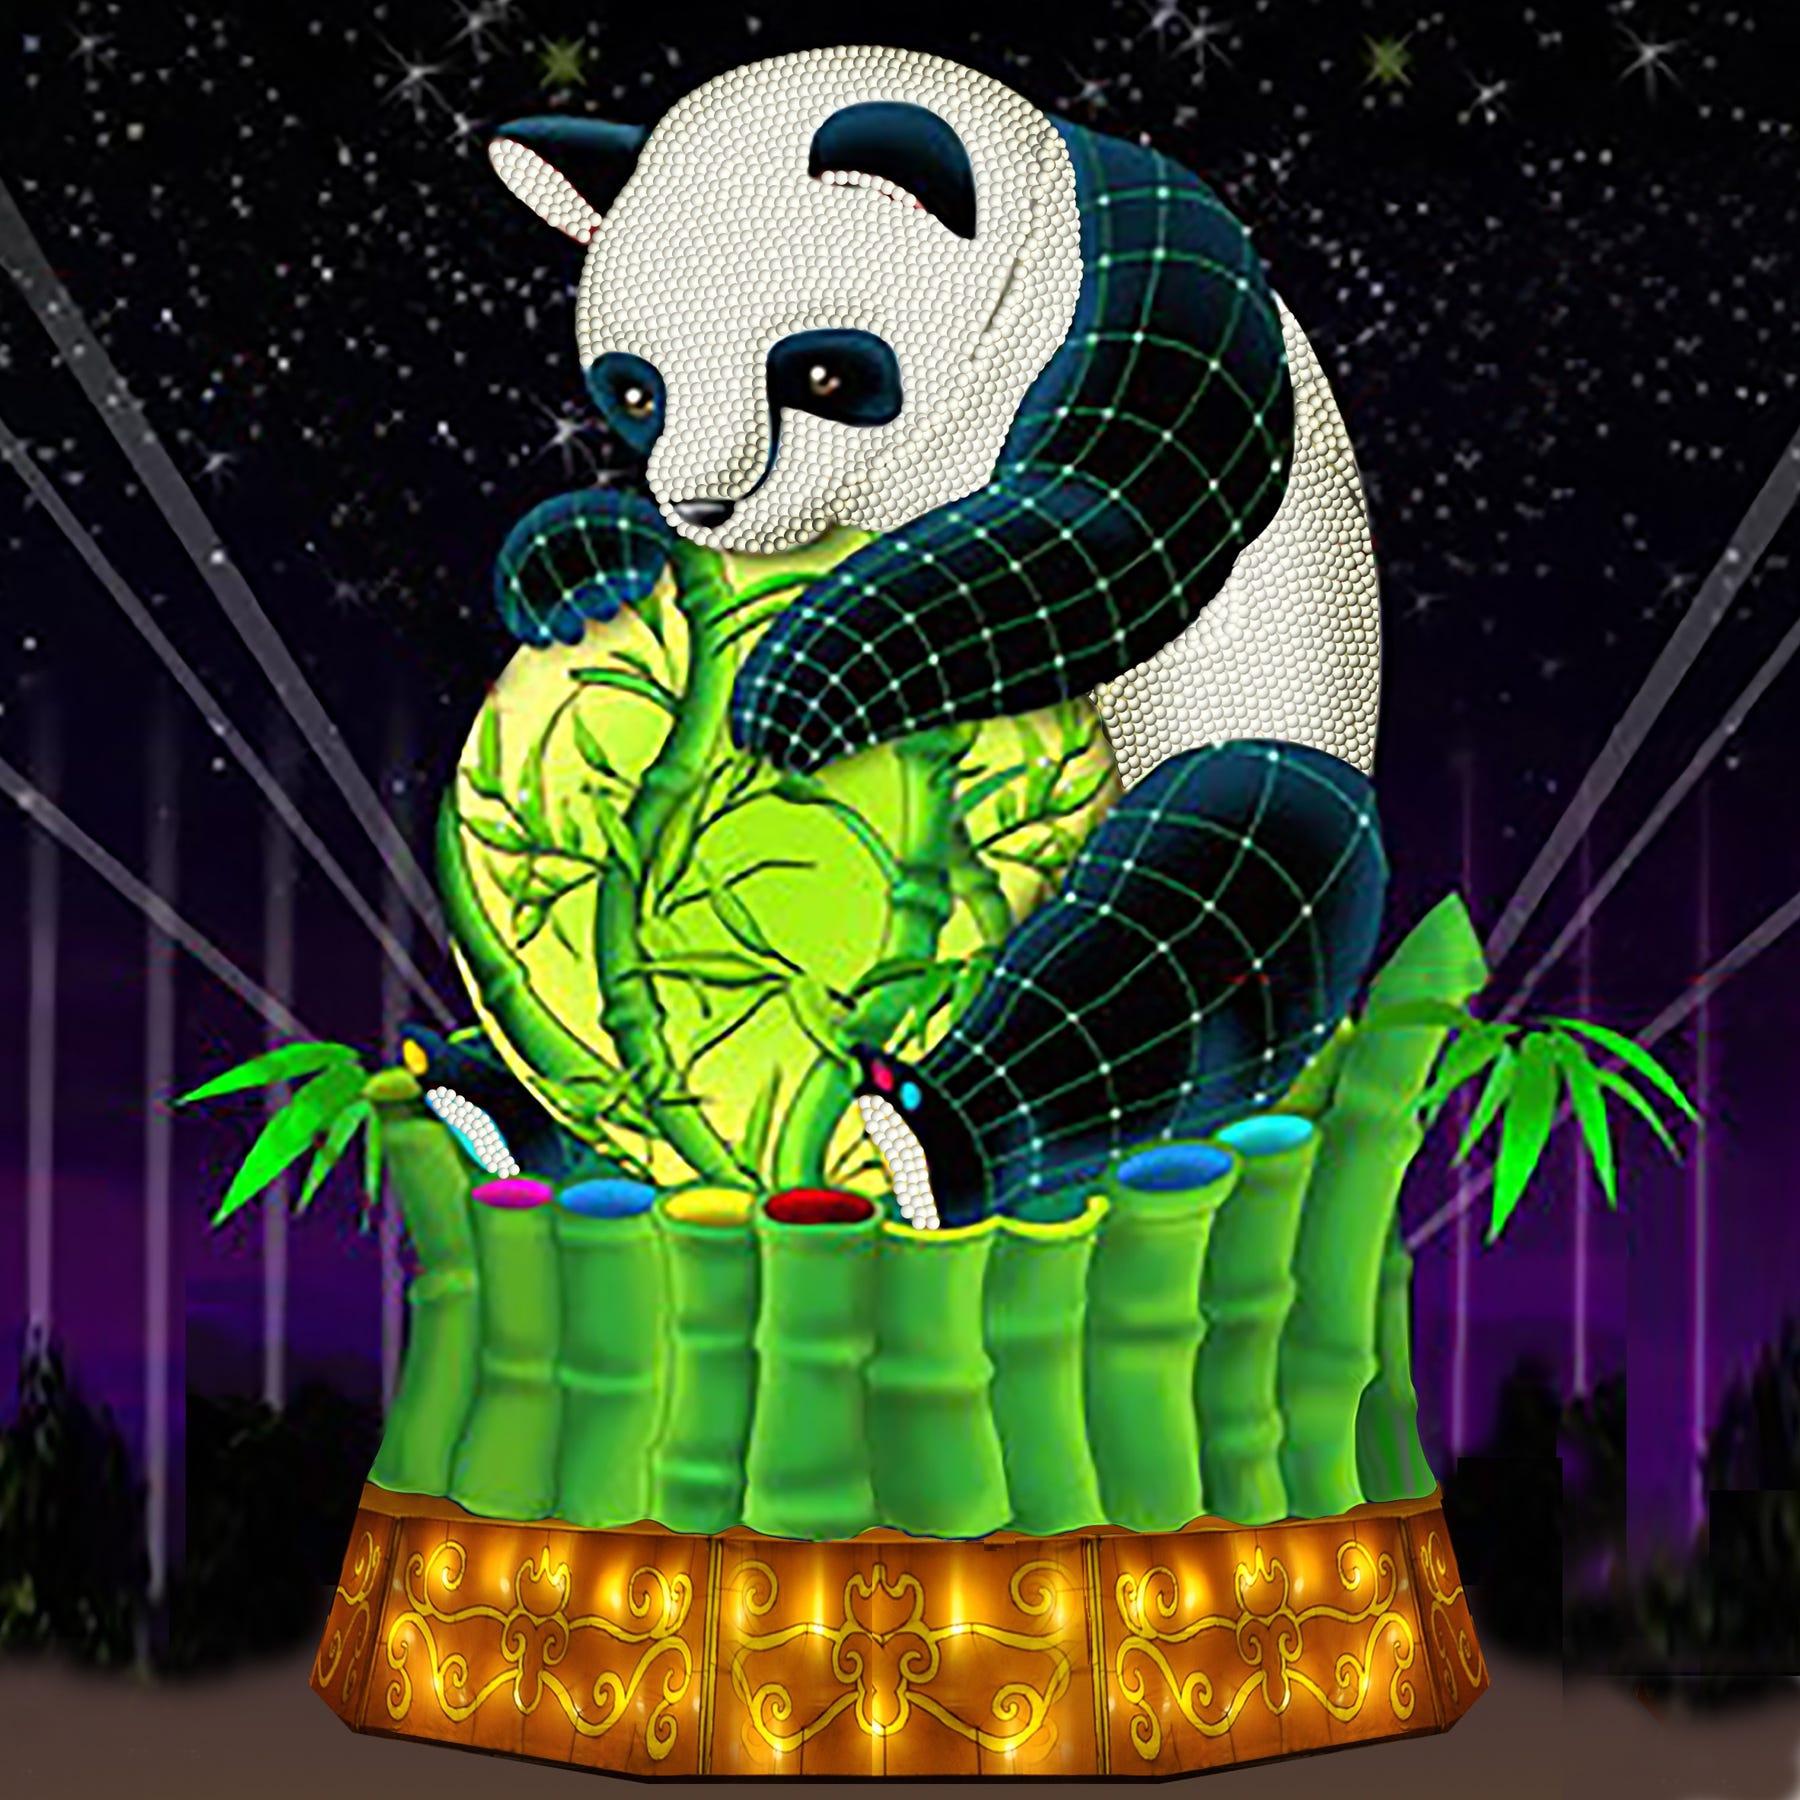 """China Lights: Panda-Mania"" concludes Sunday at Boerner Botanical Gardens."